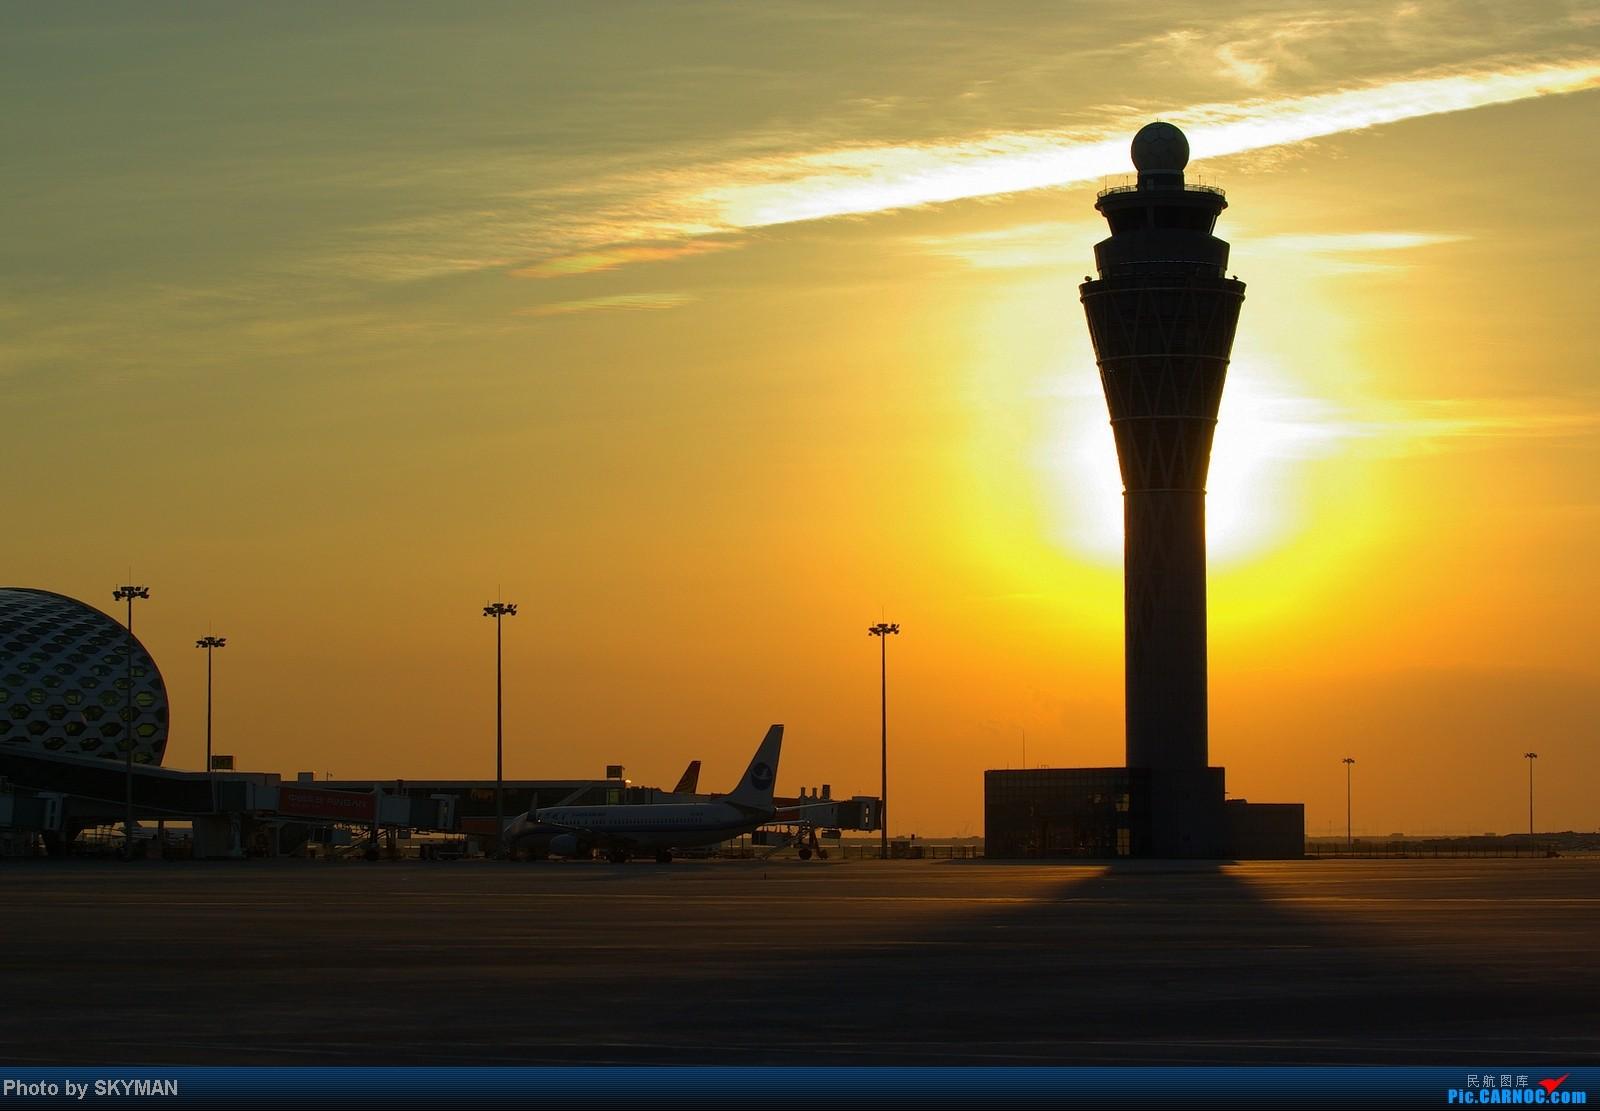 Re:[原创]别了 老六!记东航AB6在深圳机场最后一班进出港 AIRBUS A300-B4-600 B-2330 中国深圳宝安机场 中国深圳宝安机场